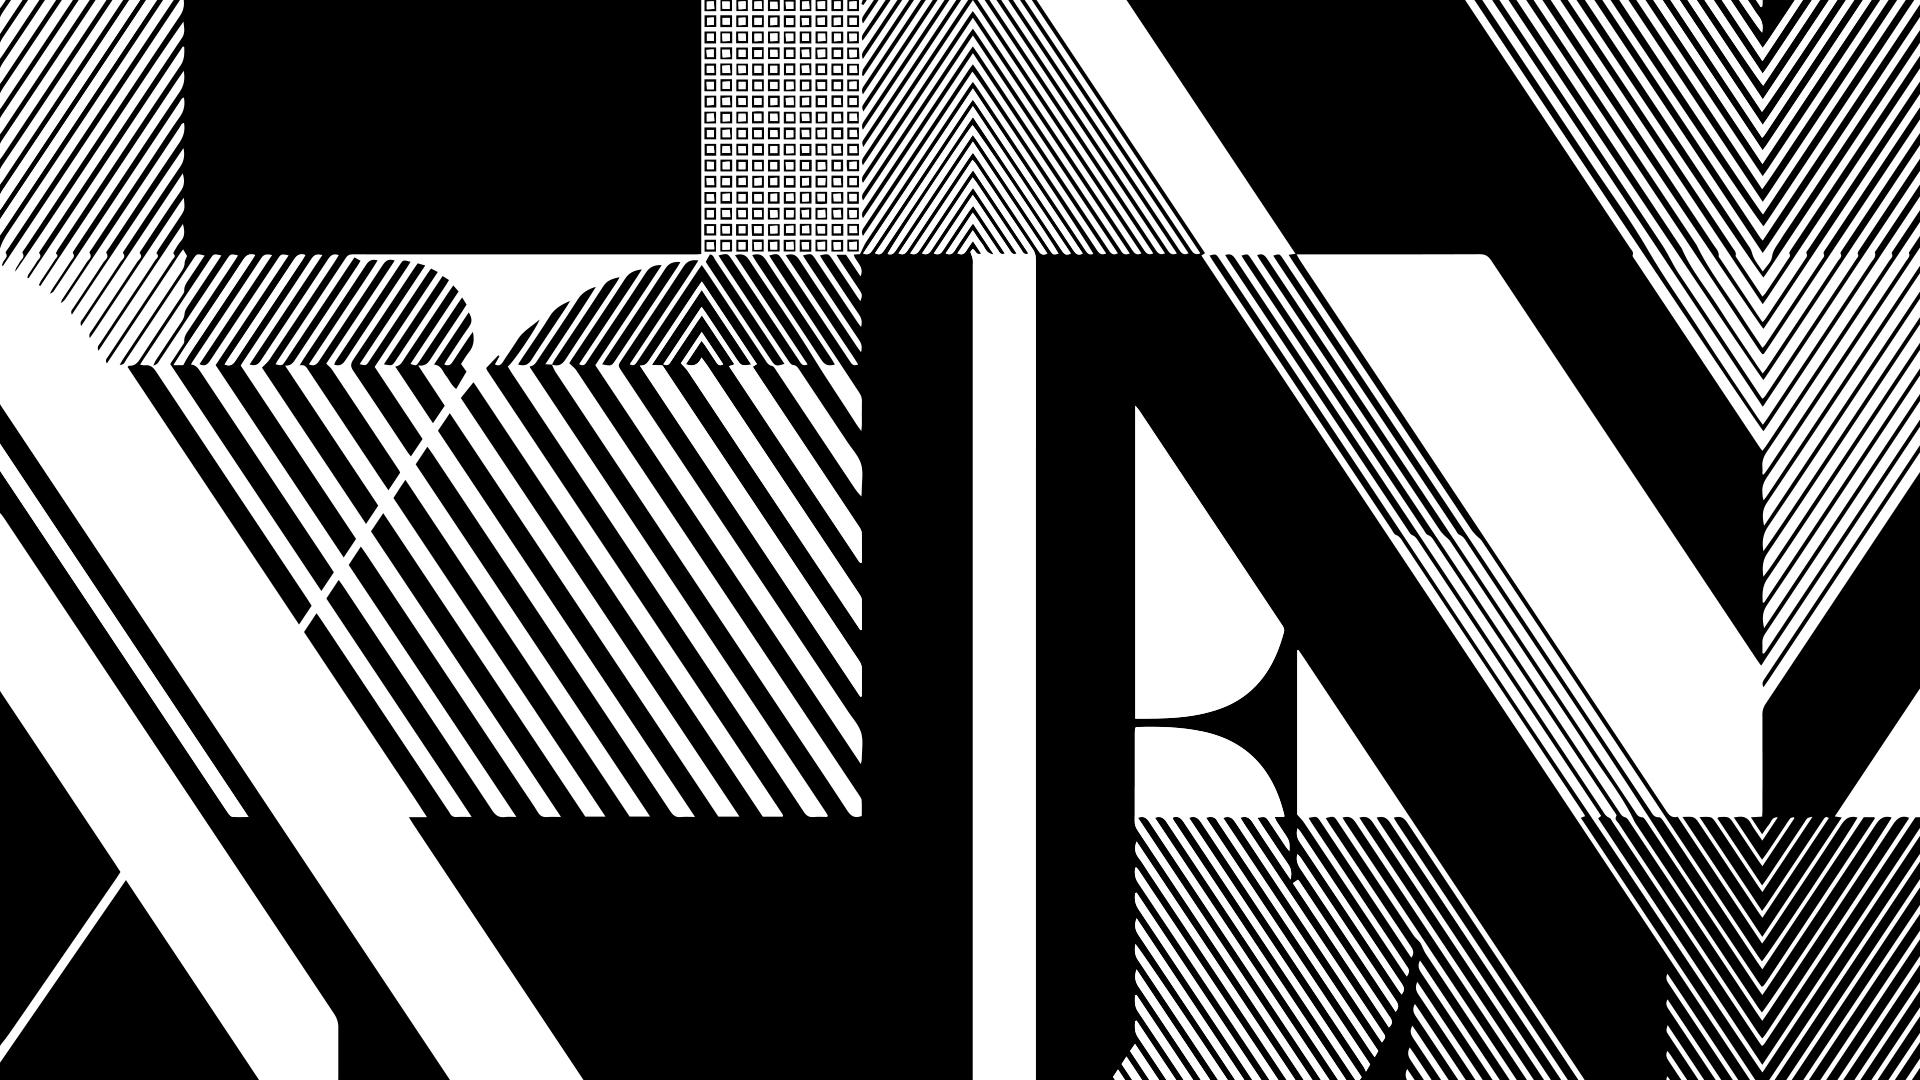 Pattern_01.jpg